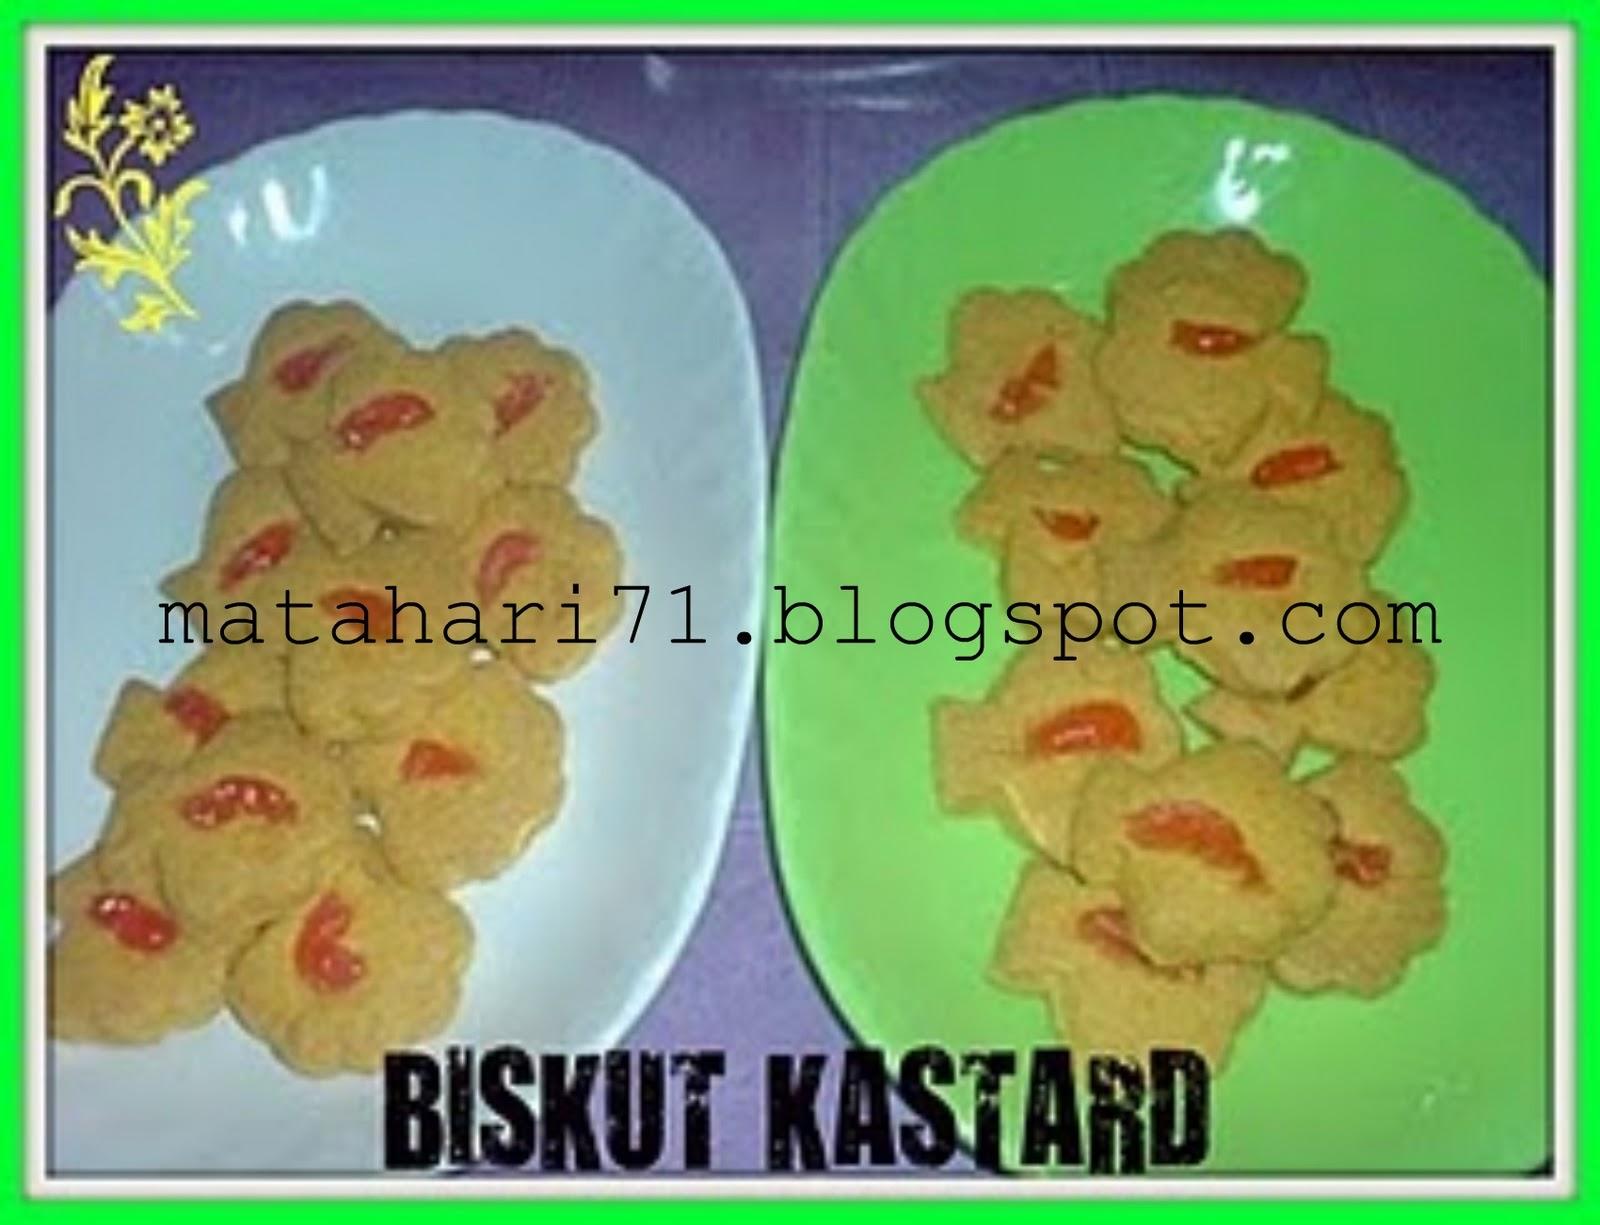 Acuan biskut online dating 1